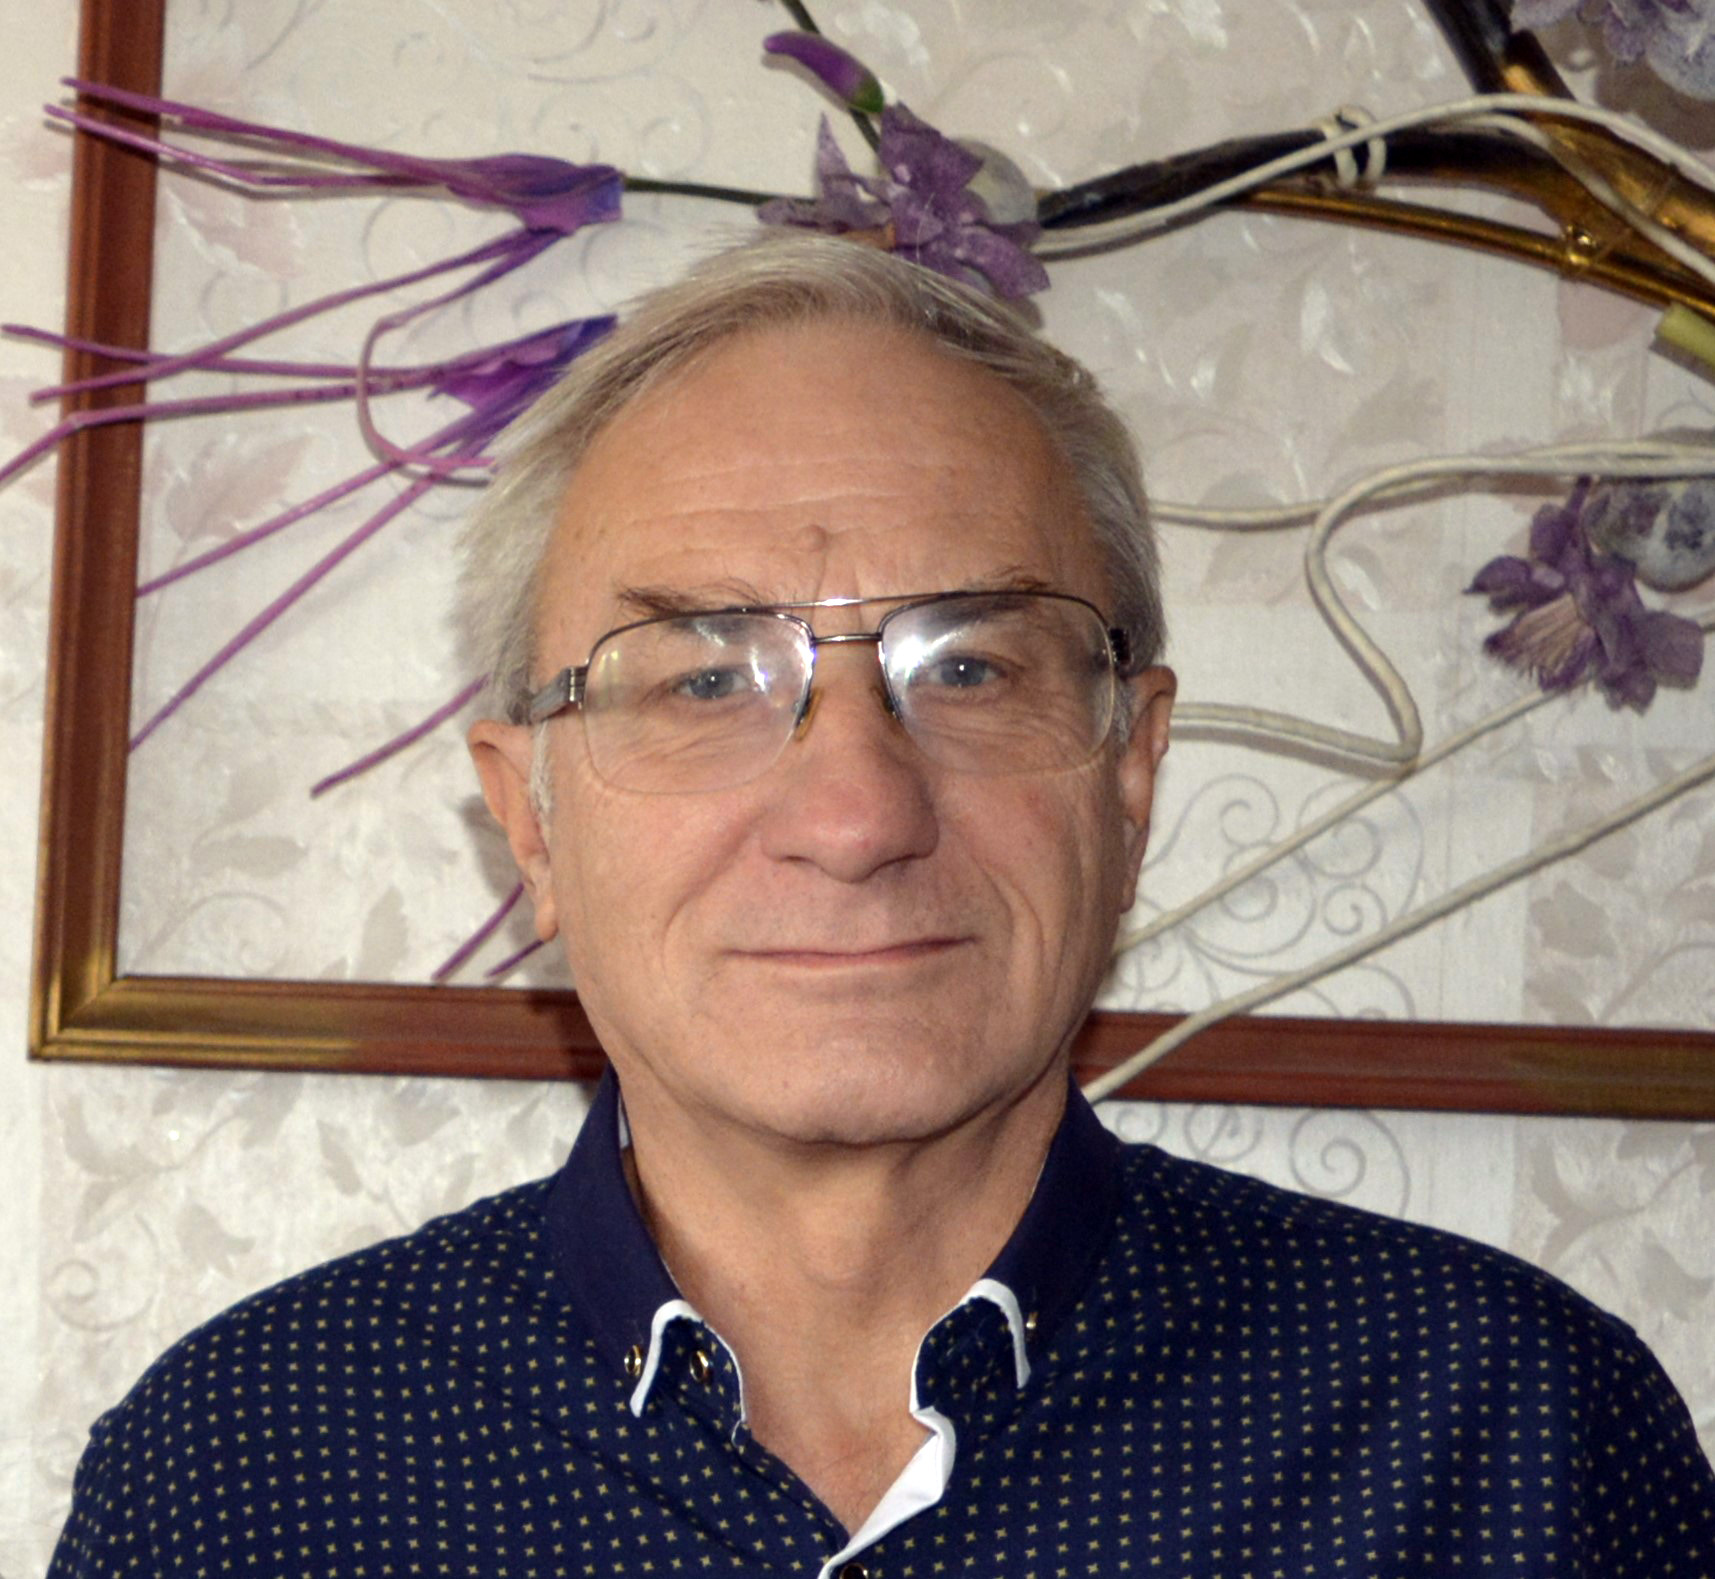 Sergei Volovikov